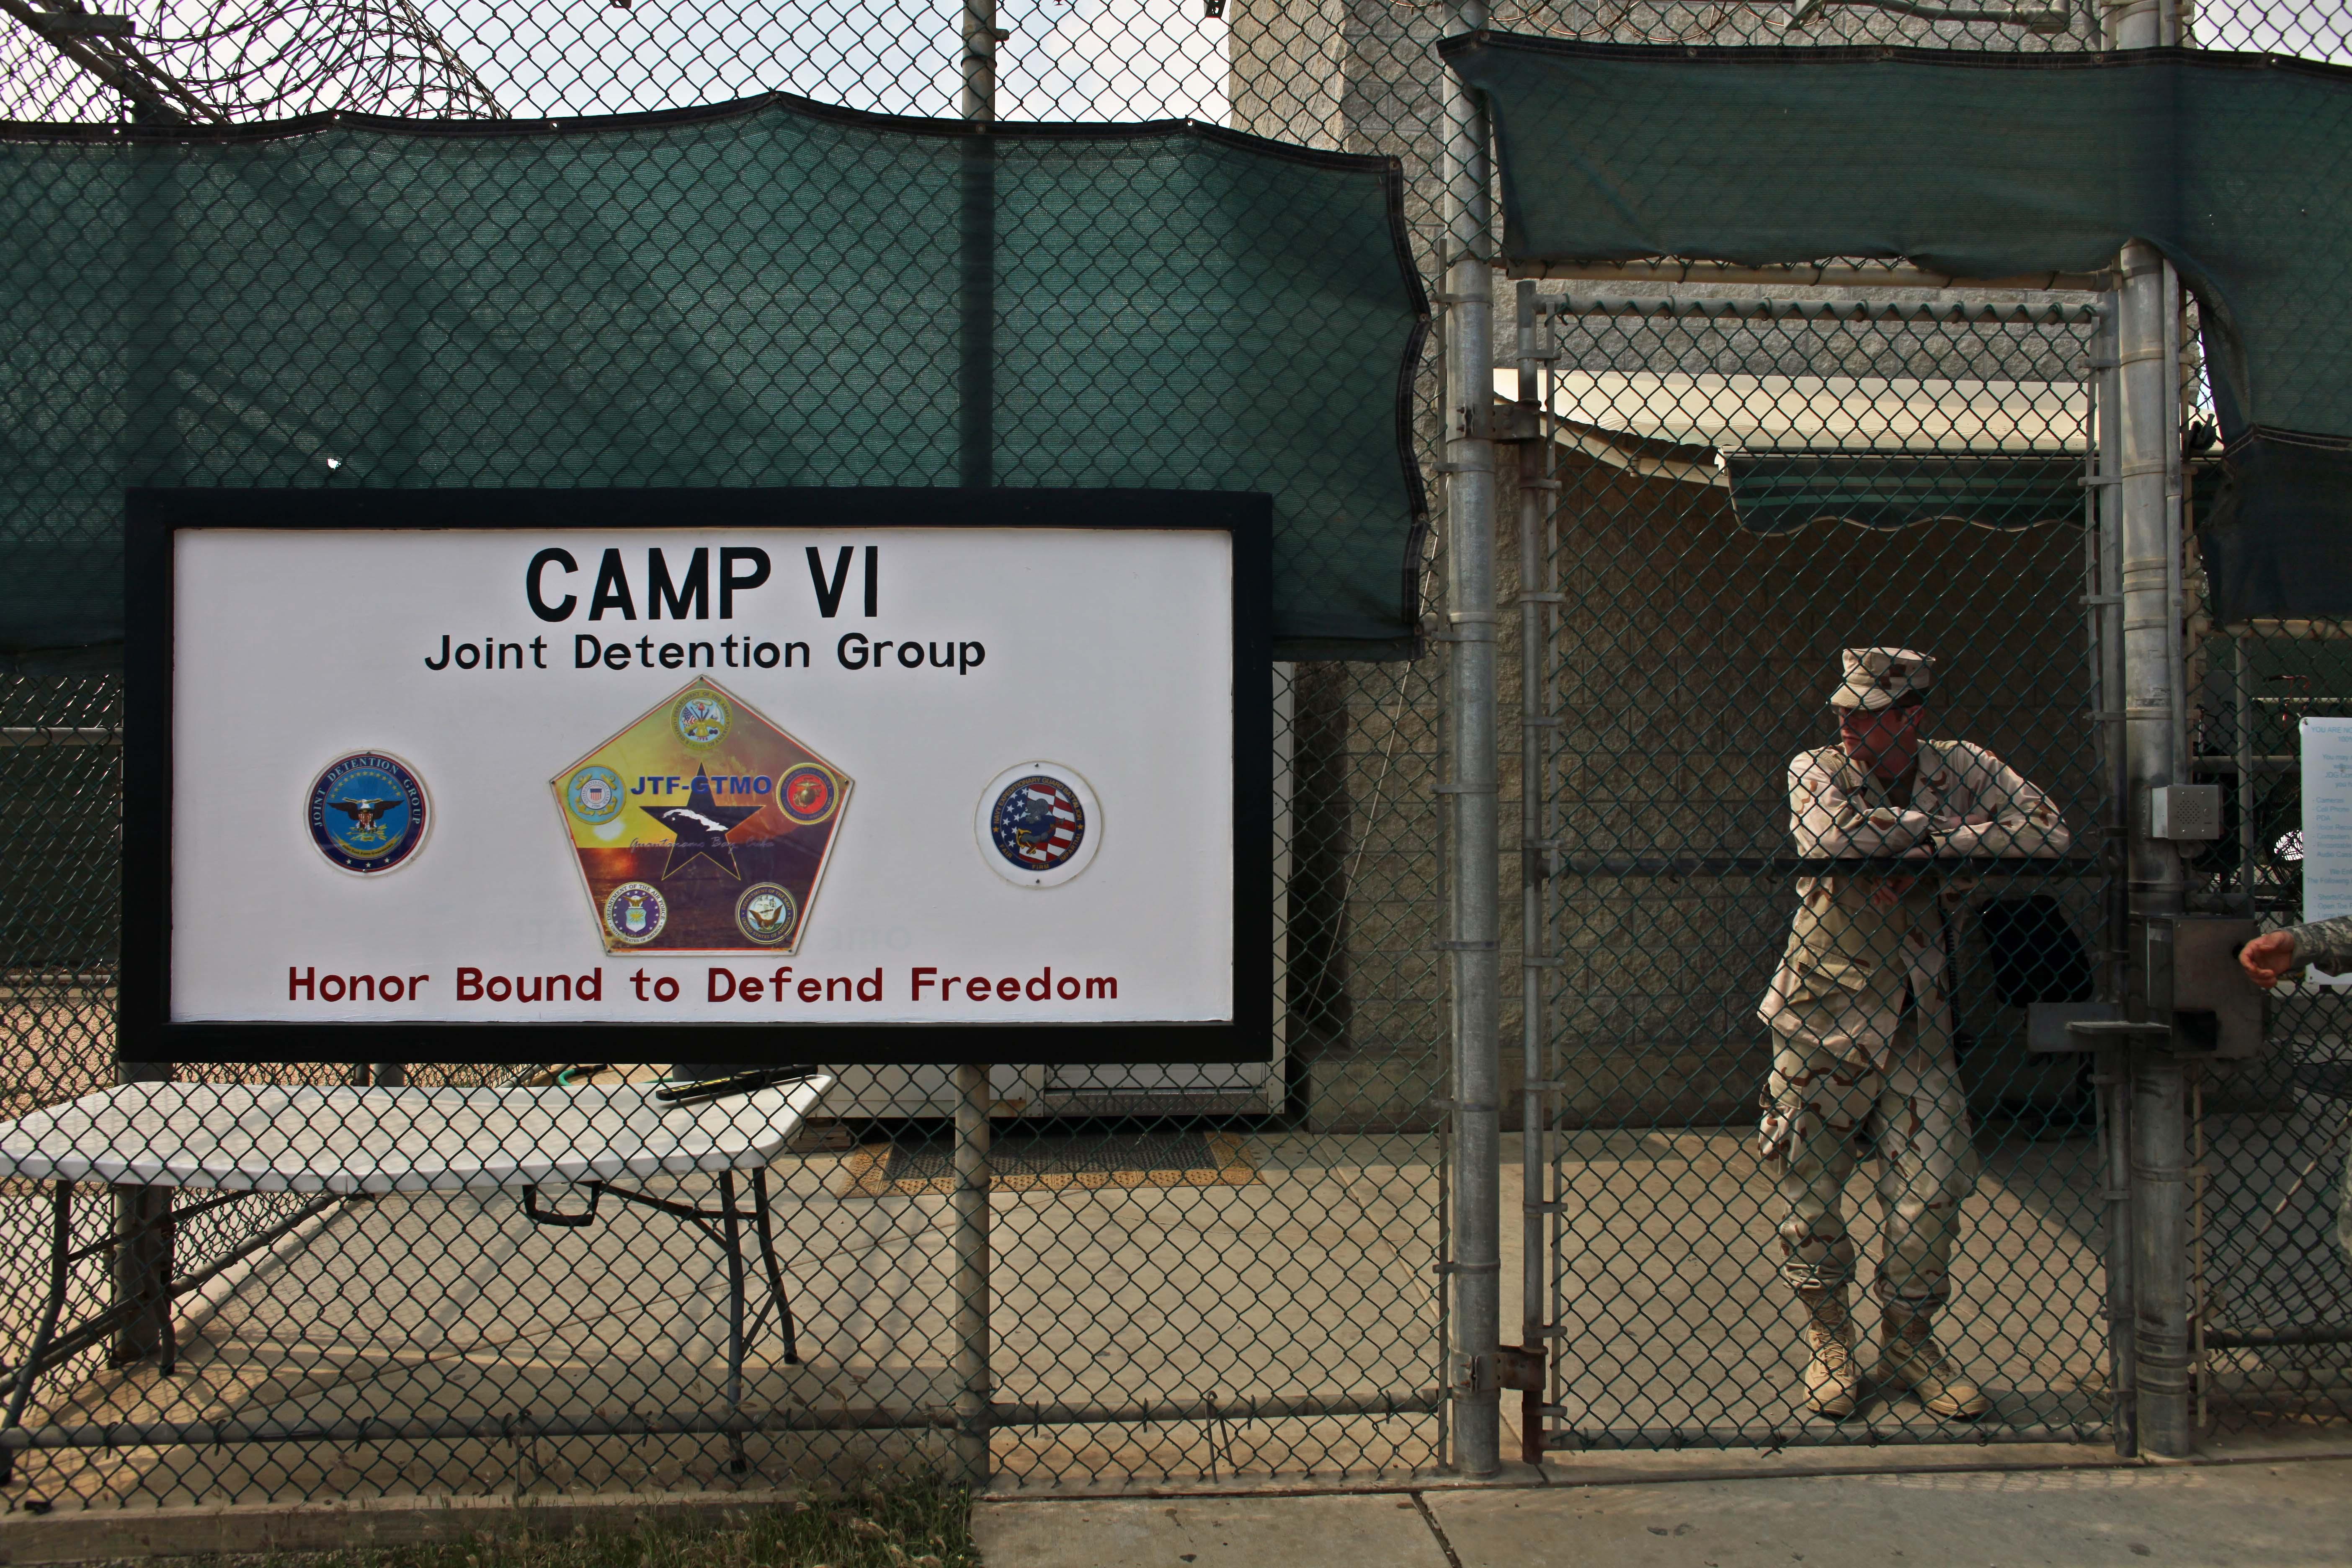 L'uragano Matthew vicino a Cuba. Usa evacuano Guantanamo